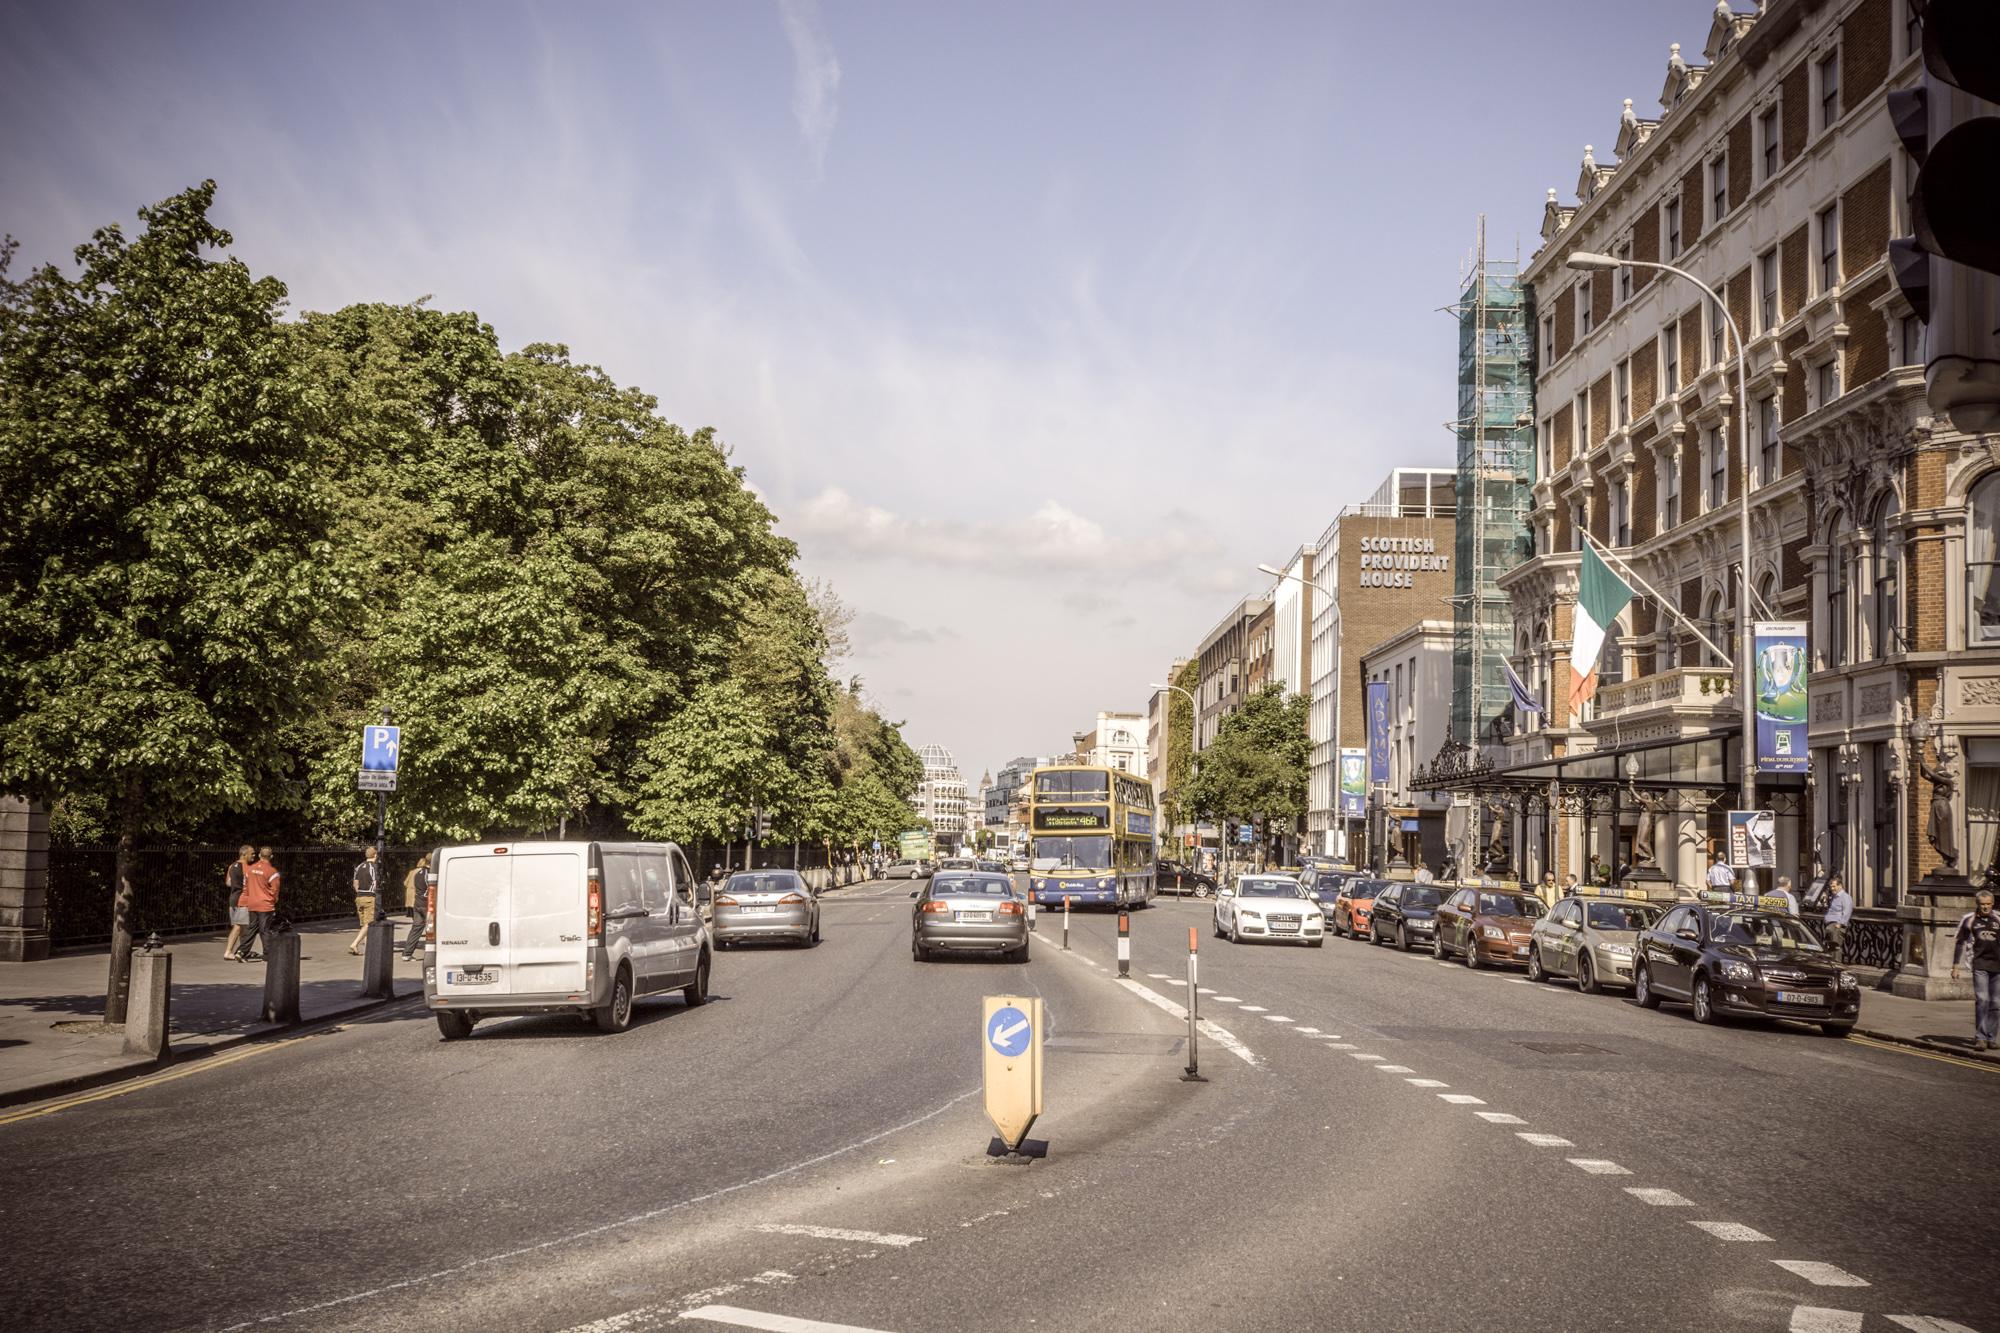 Merrion Row